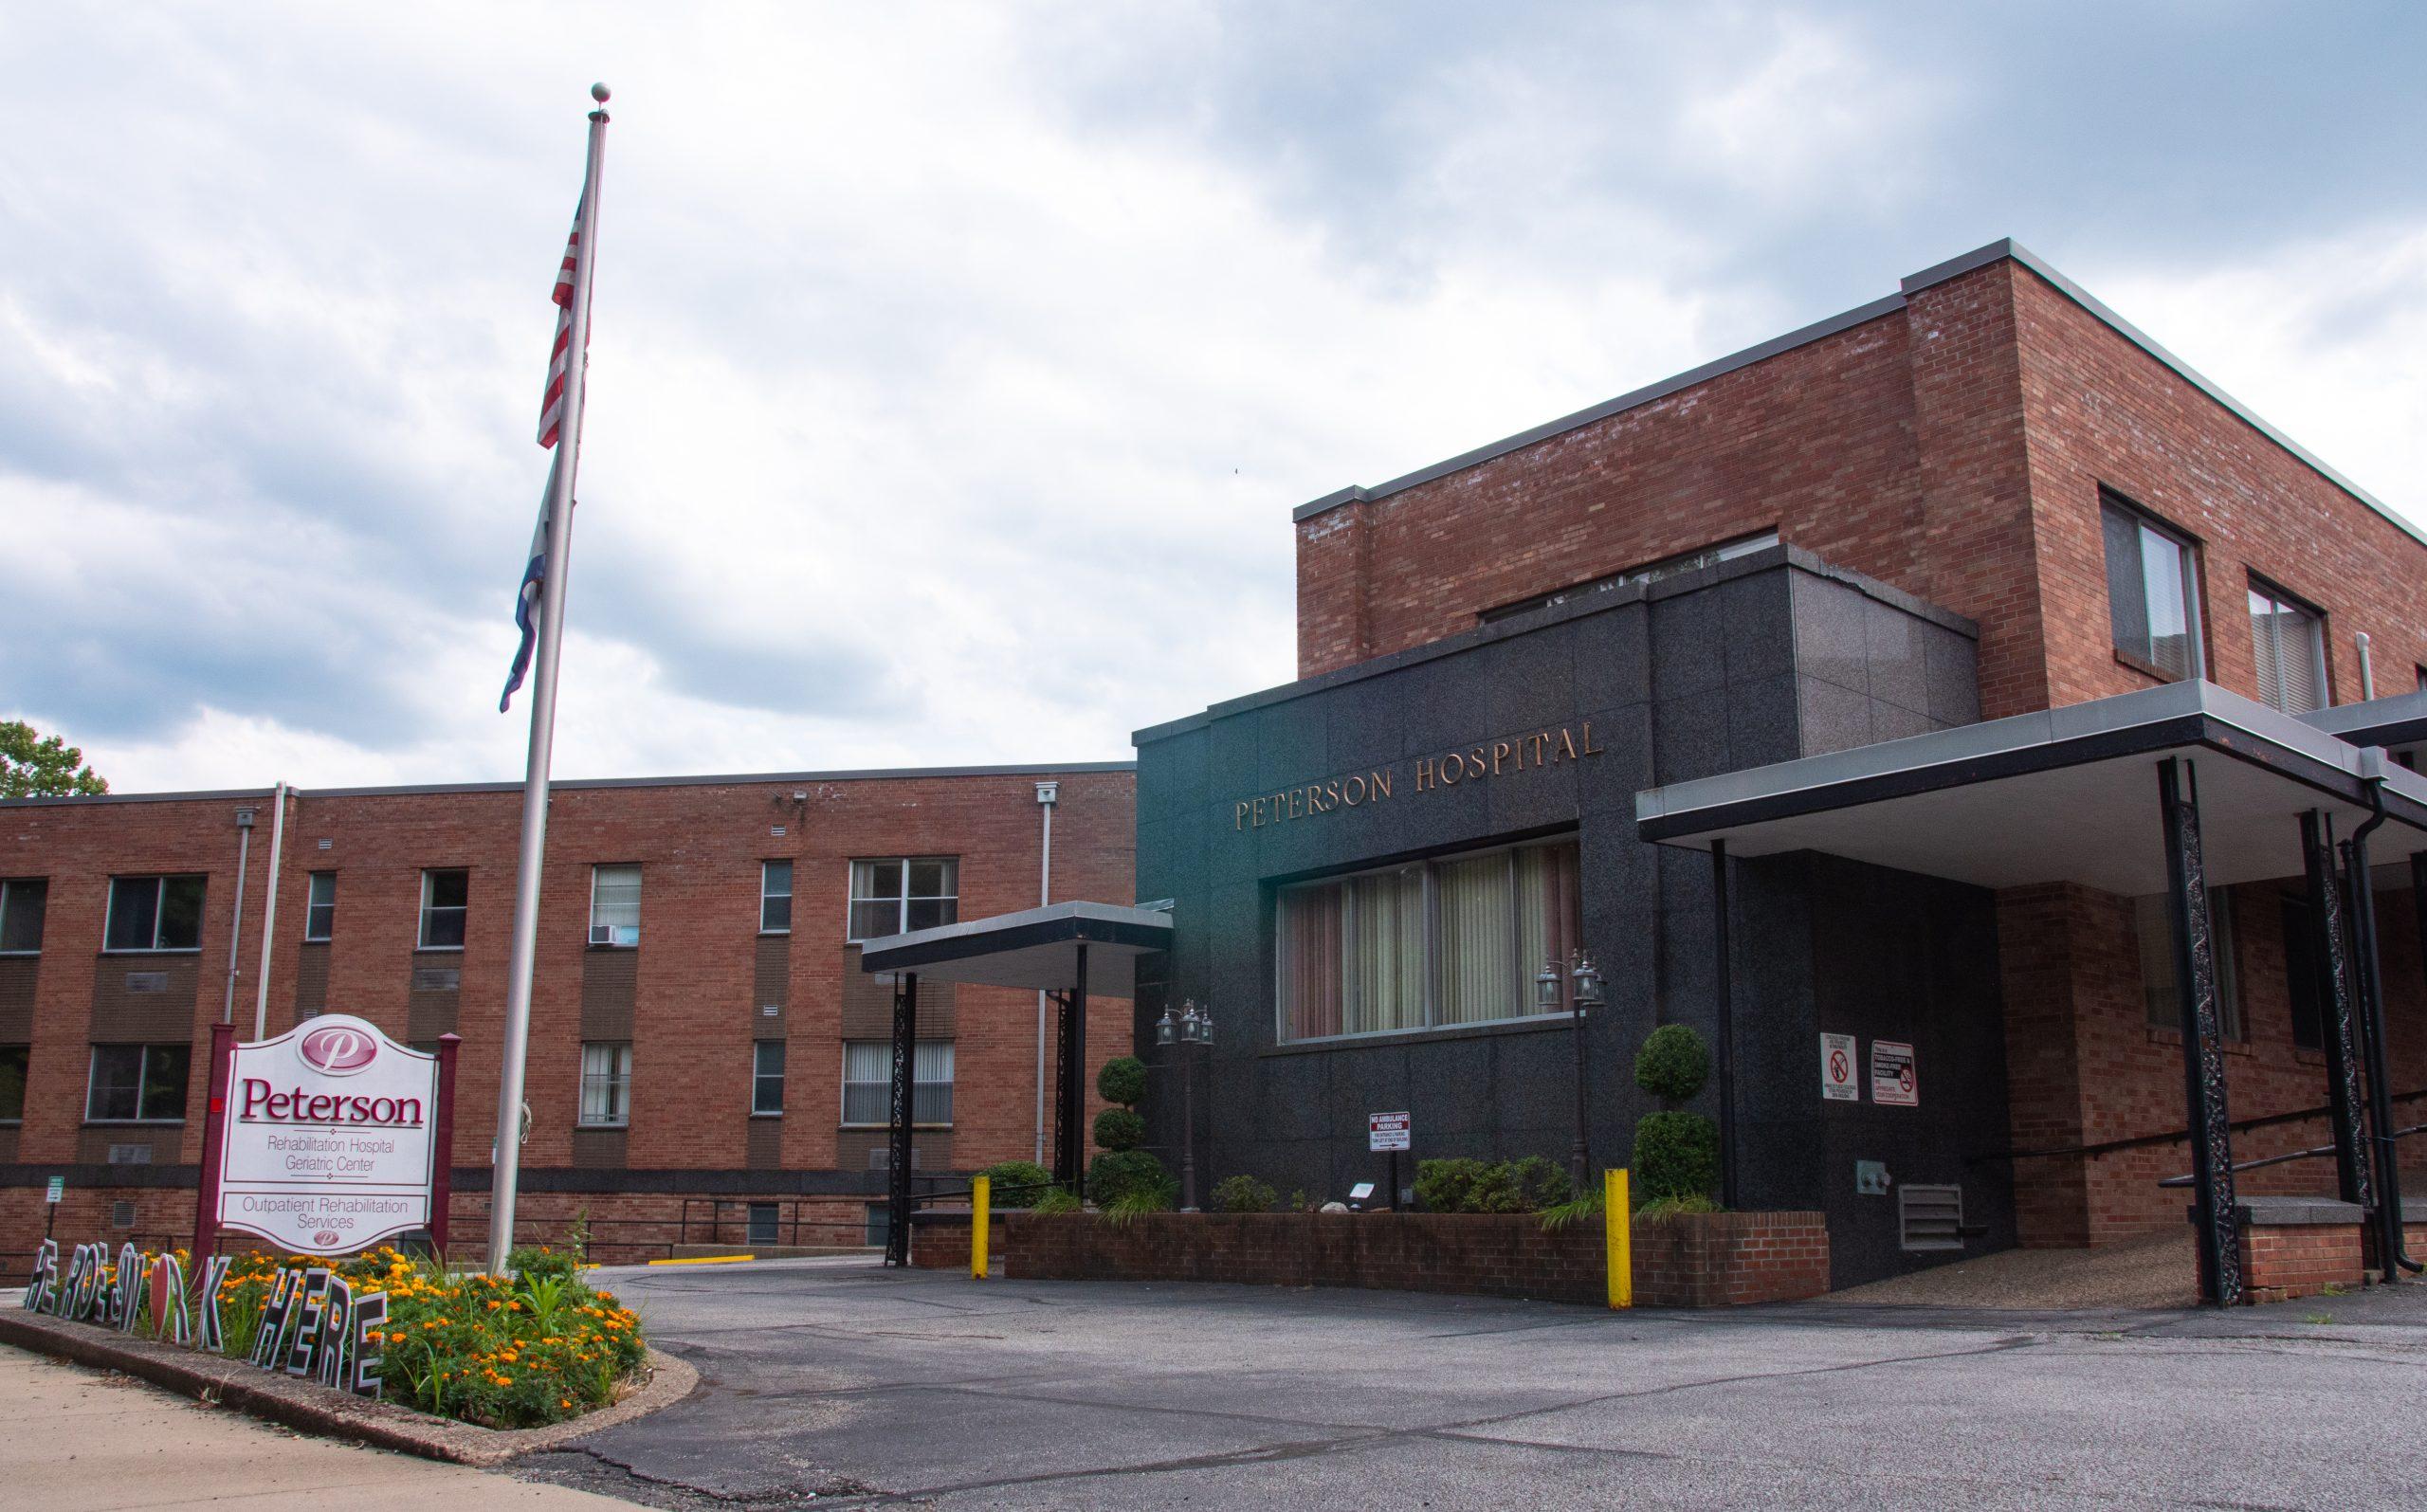 Peterson Hospital